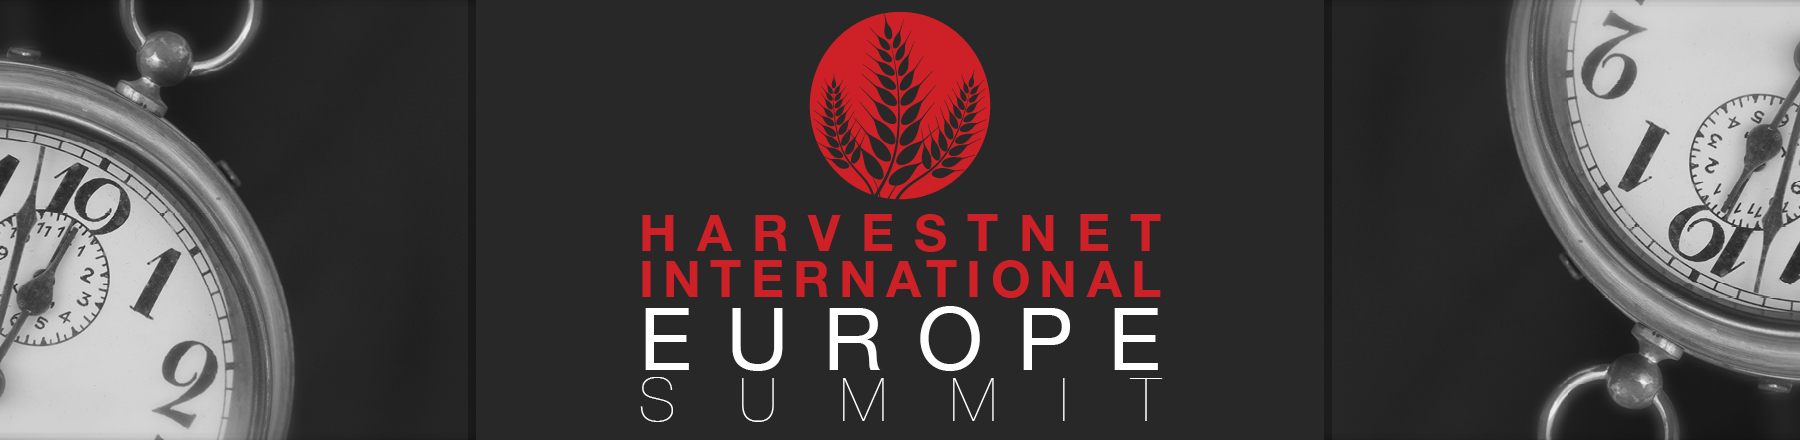 Europe summit banner 2017 main 1